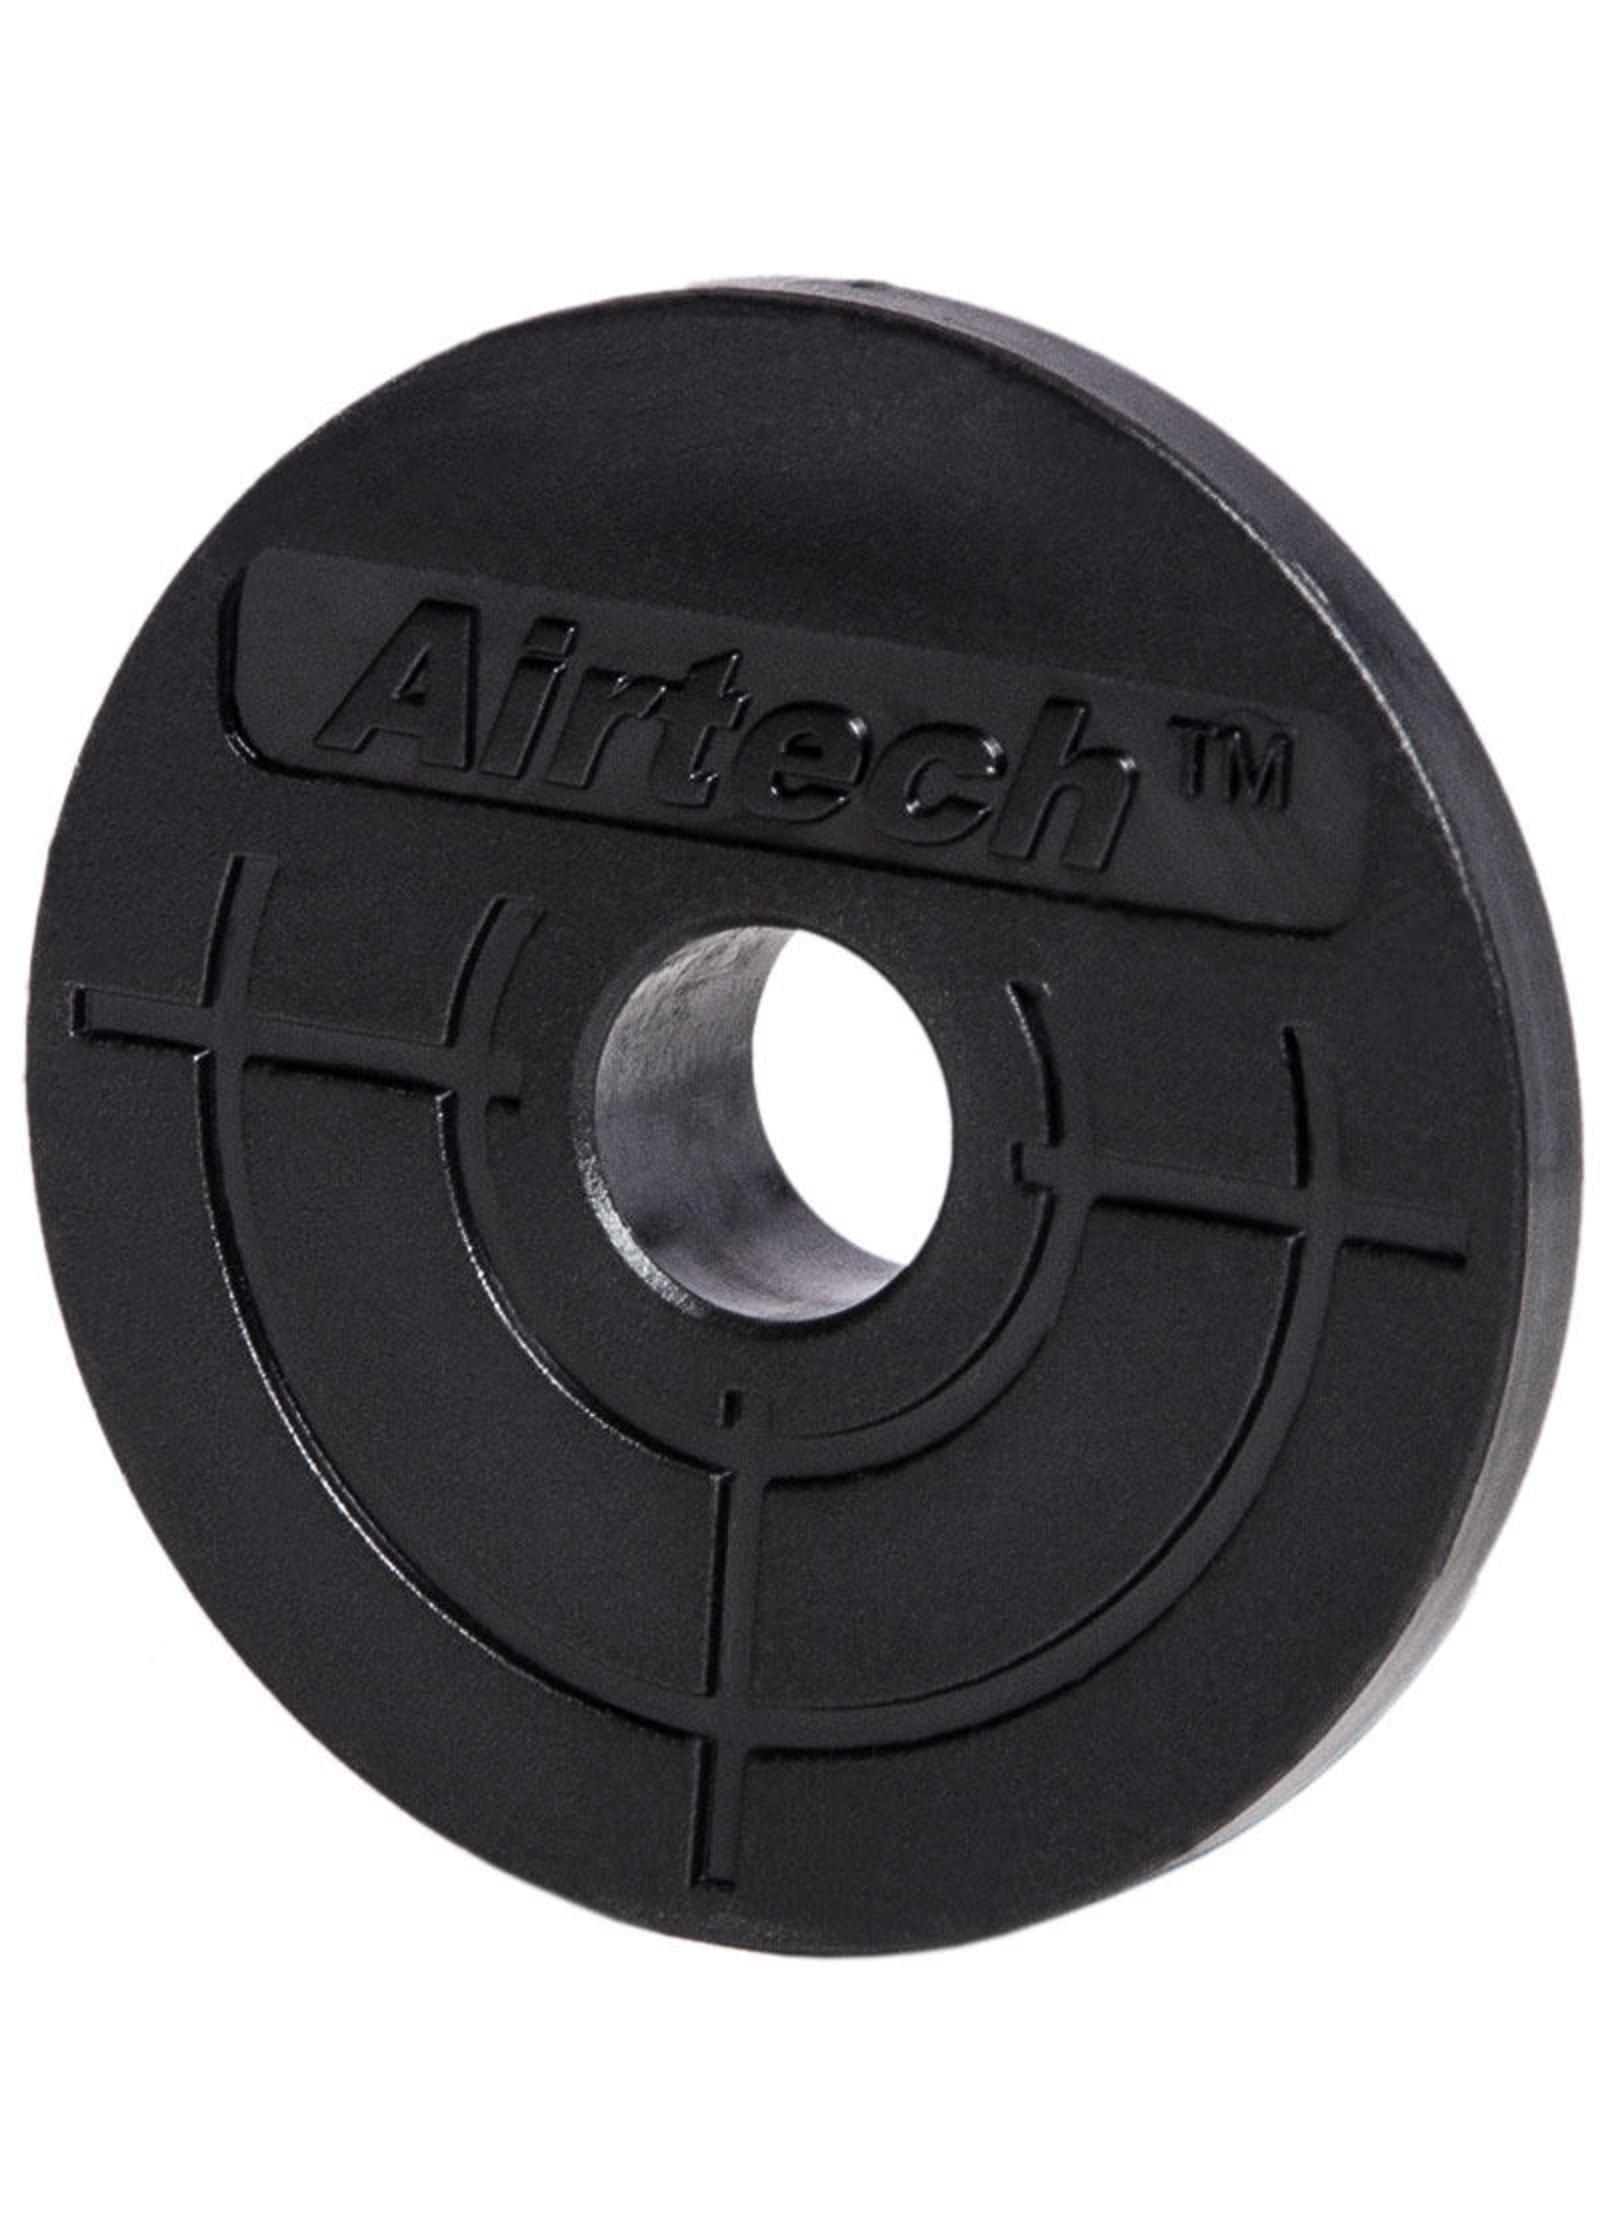 Airtech Studios BSU Barrel Stabiliser Unit for AM-013 product image